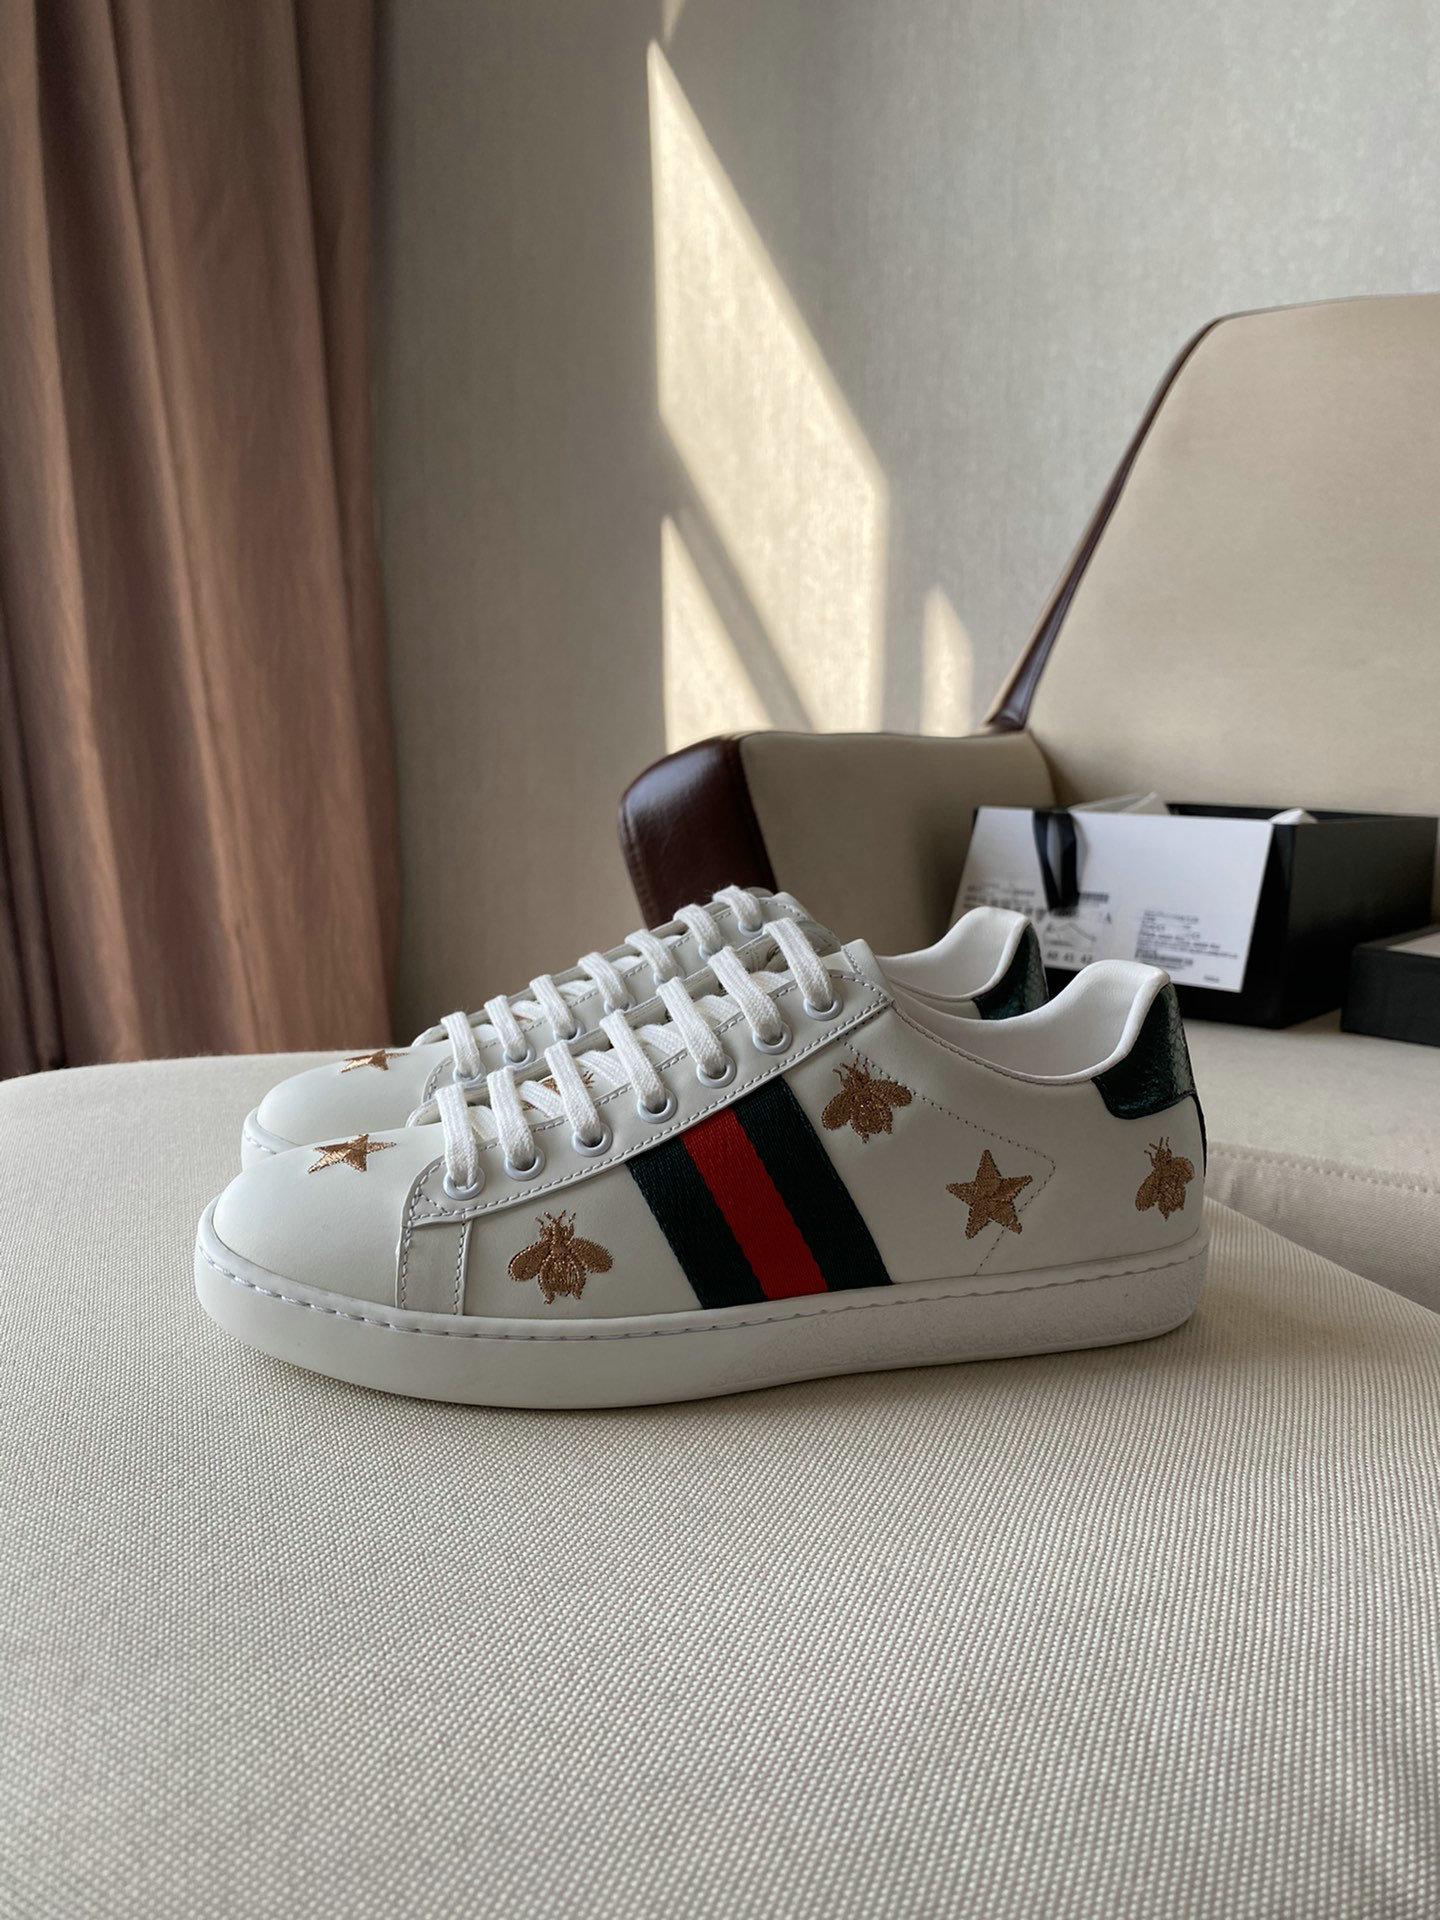 2021New Sneakres الصيف امرأة أحذية رياضية غير رسمية الكتابة على الجدران الشقق السيدات أحذية مفلكنة أحذية الخريف الأبيض